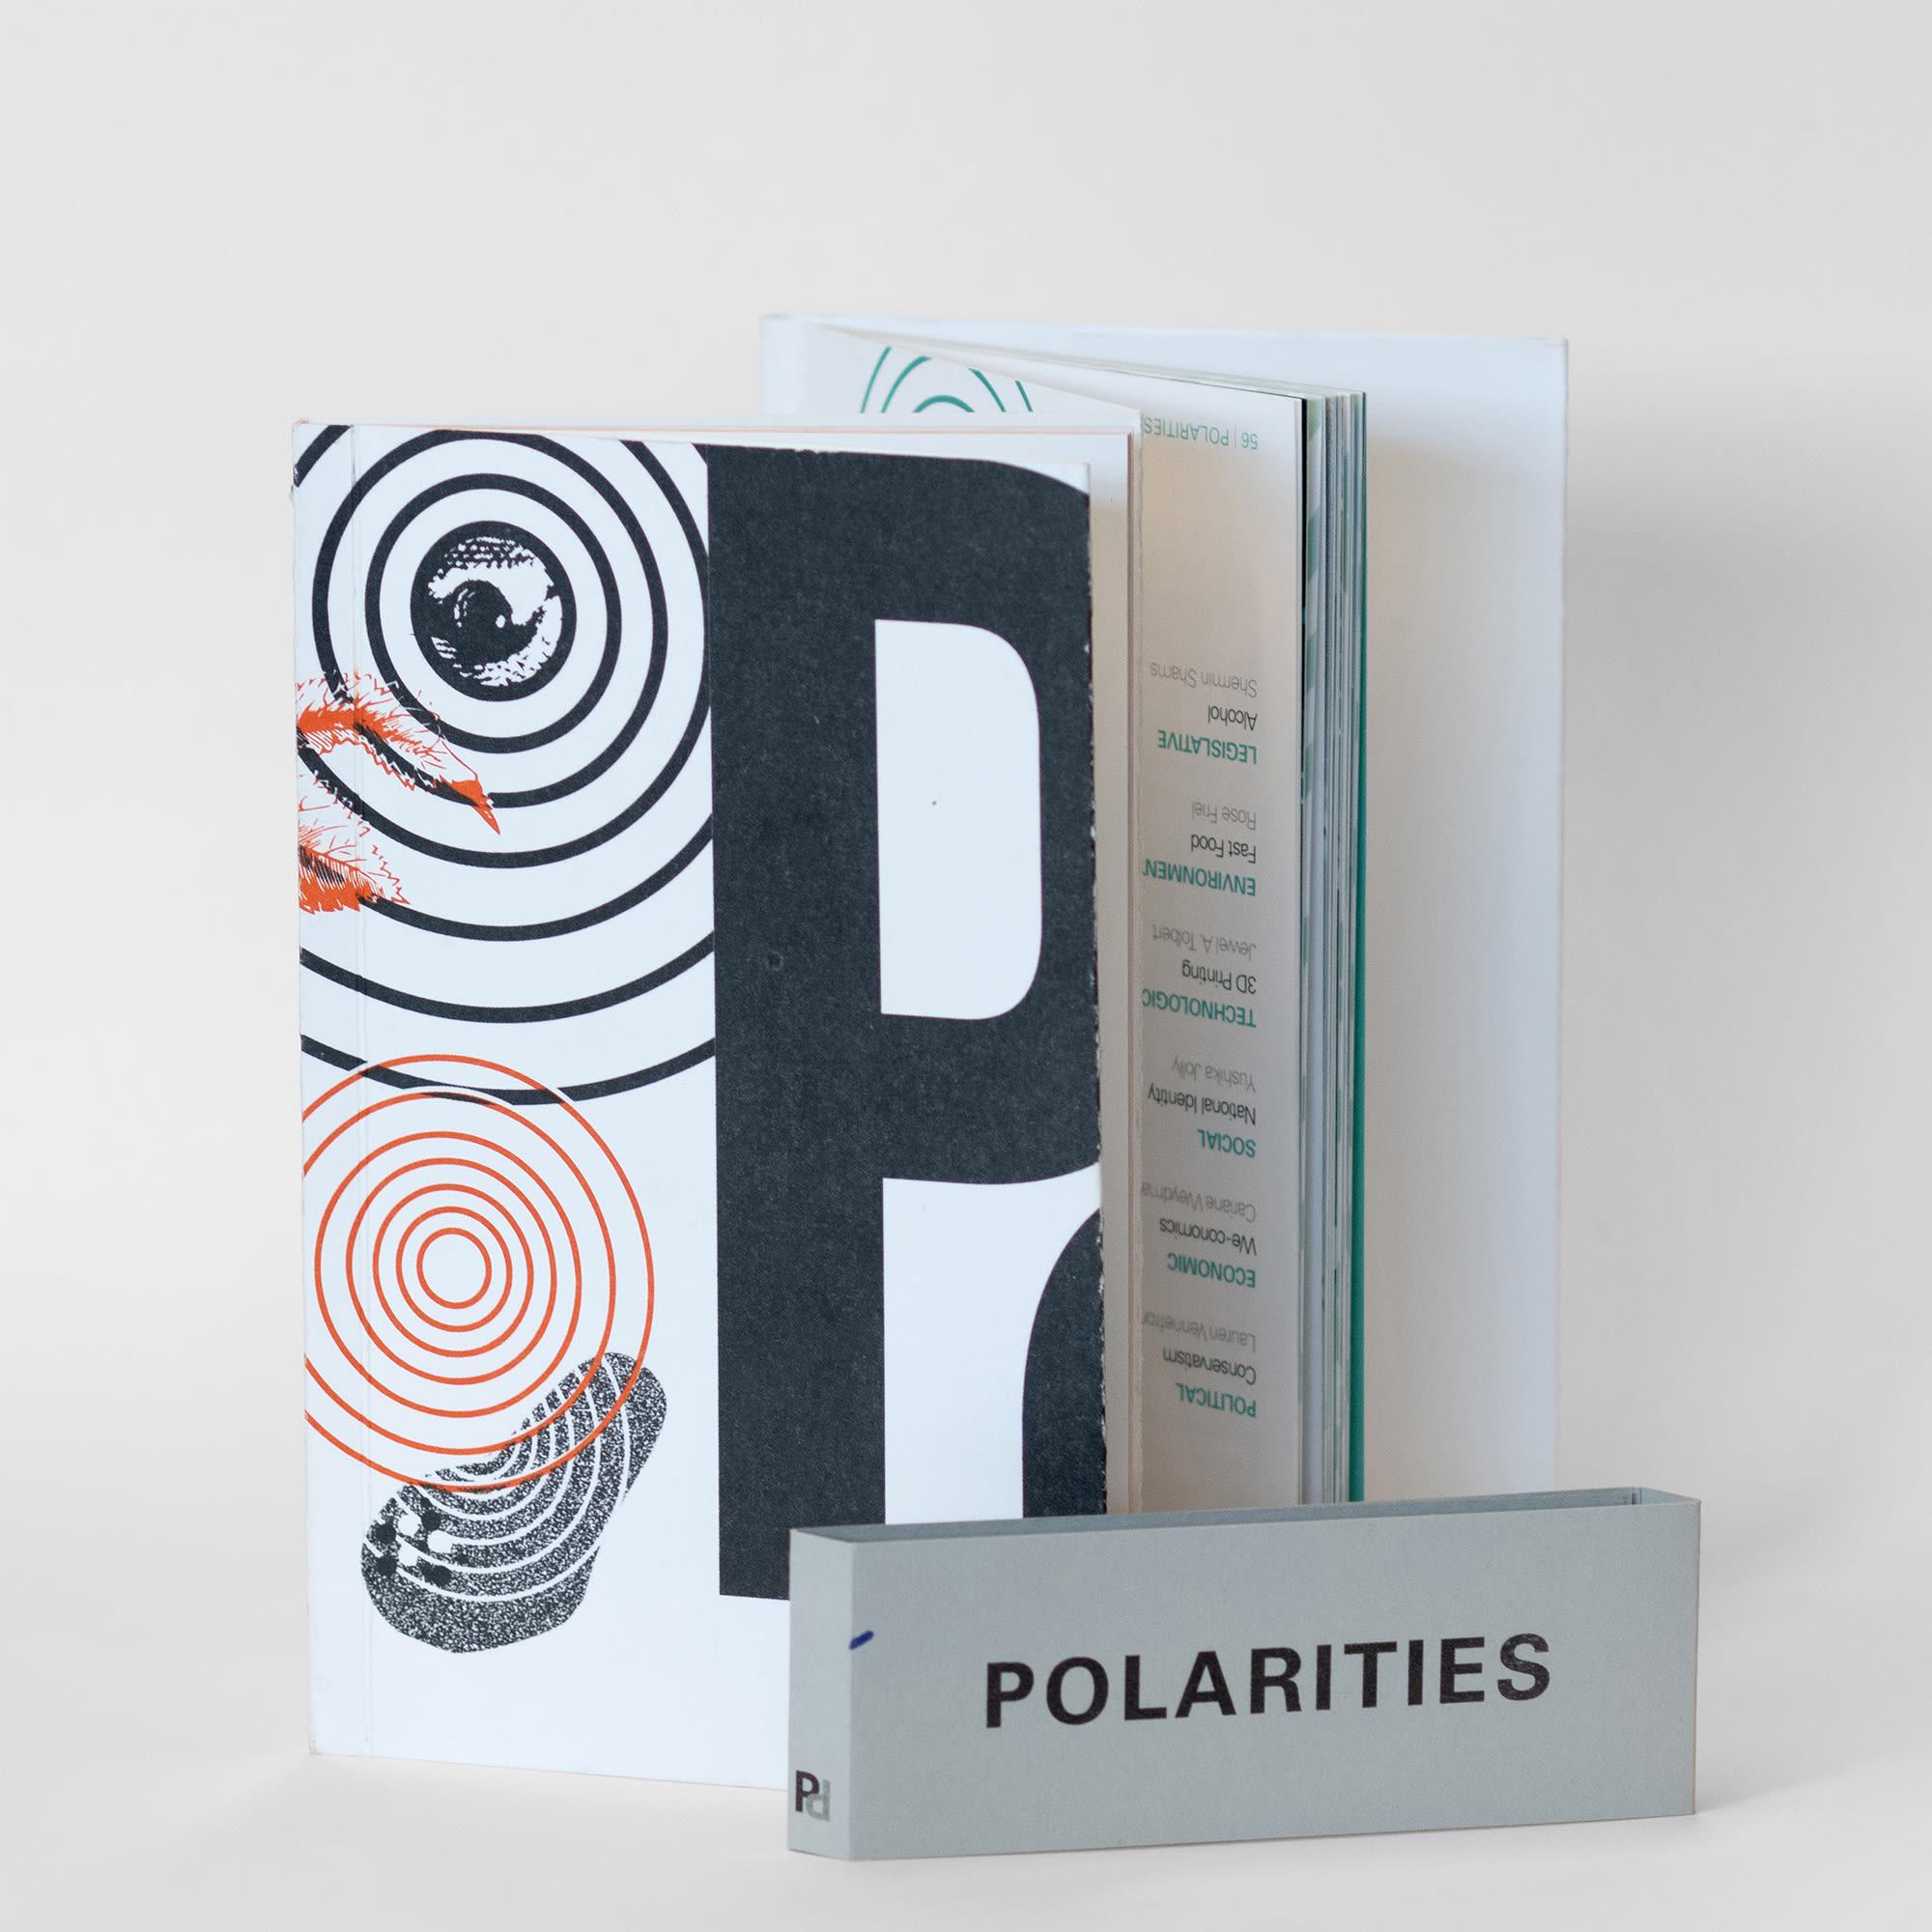 polarities-ma-publishing3.jpg